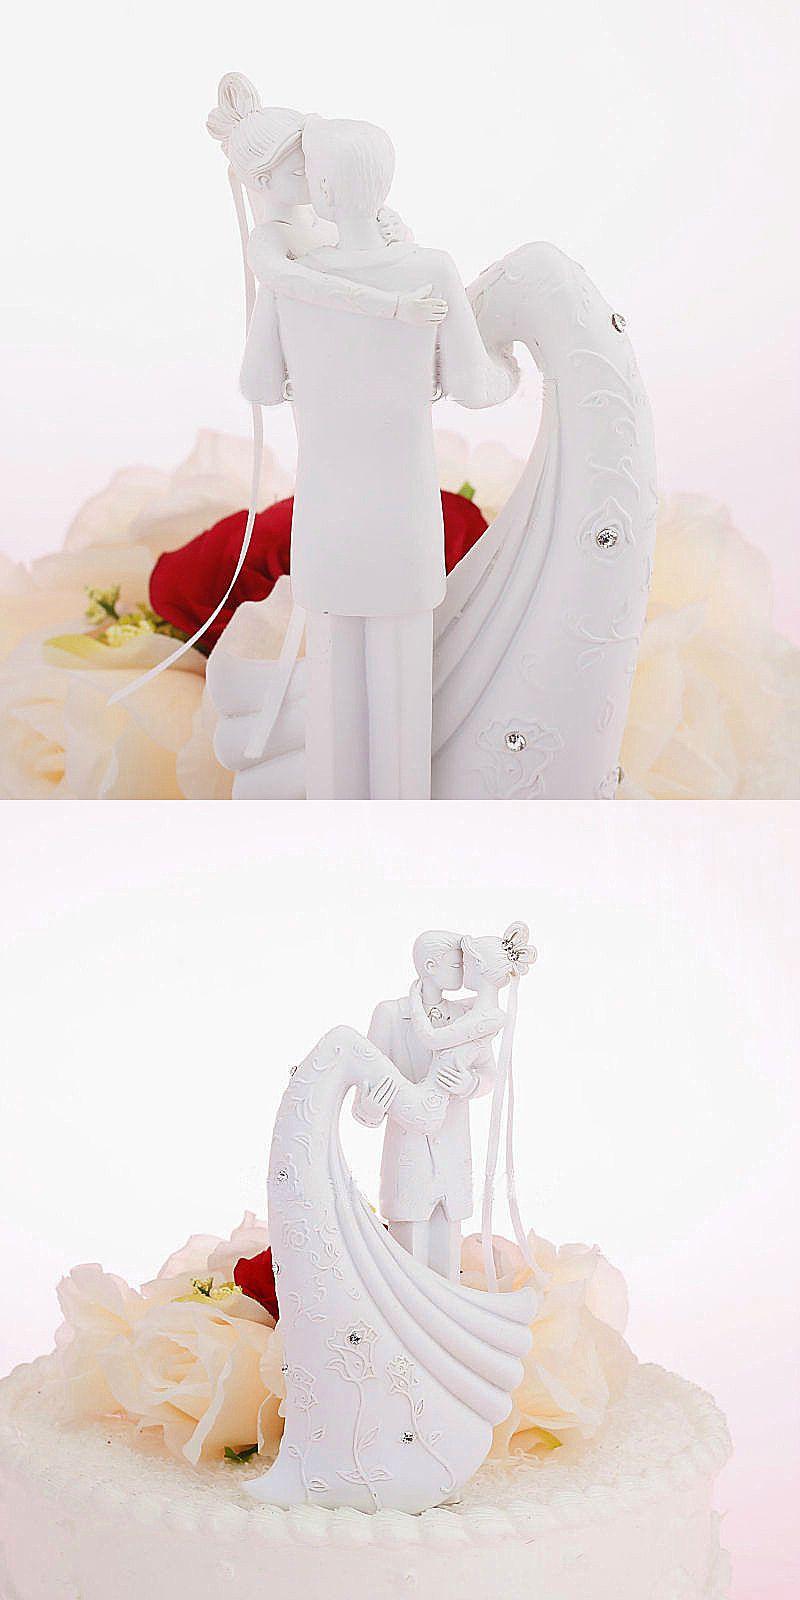 European-Style Wedding Cake Decoration Wedding Dolls White Romantic Wedding Cake Topper The Bride And Groom Cake Decoration